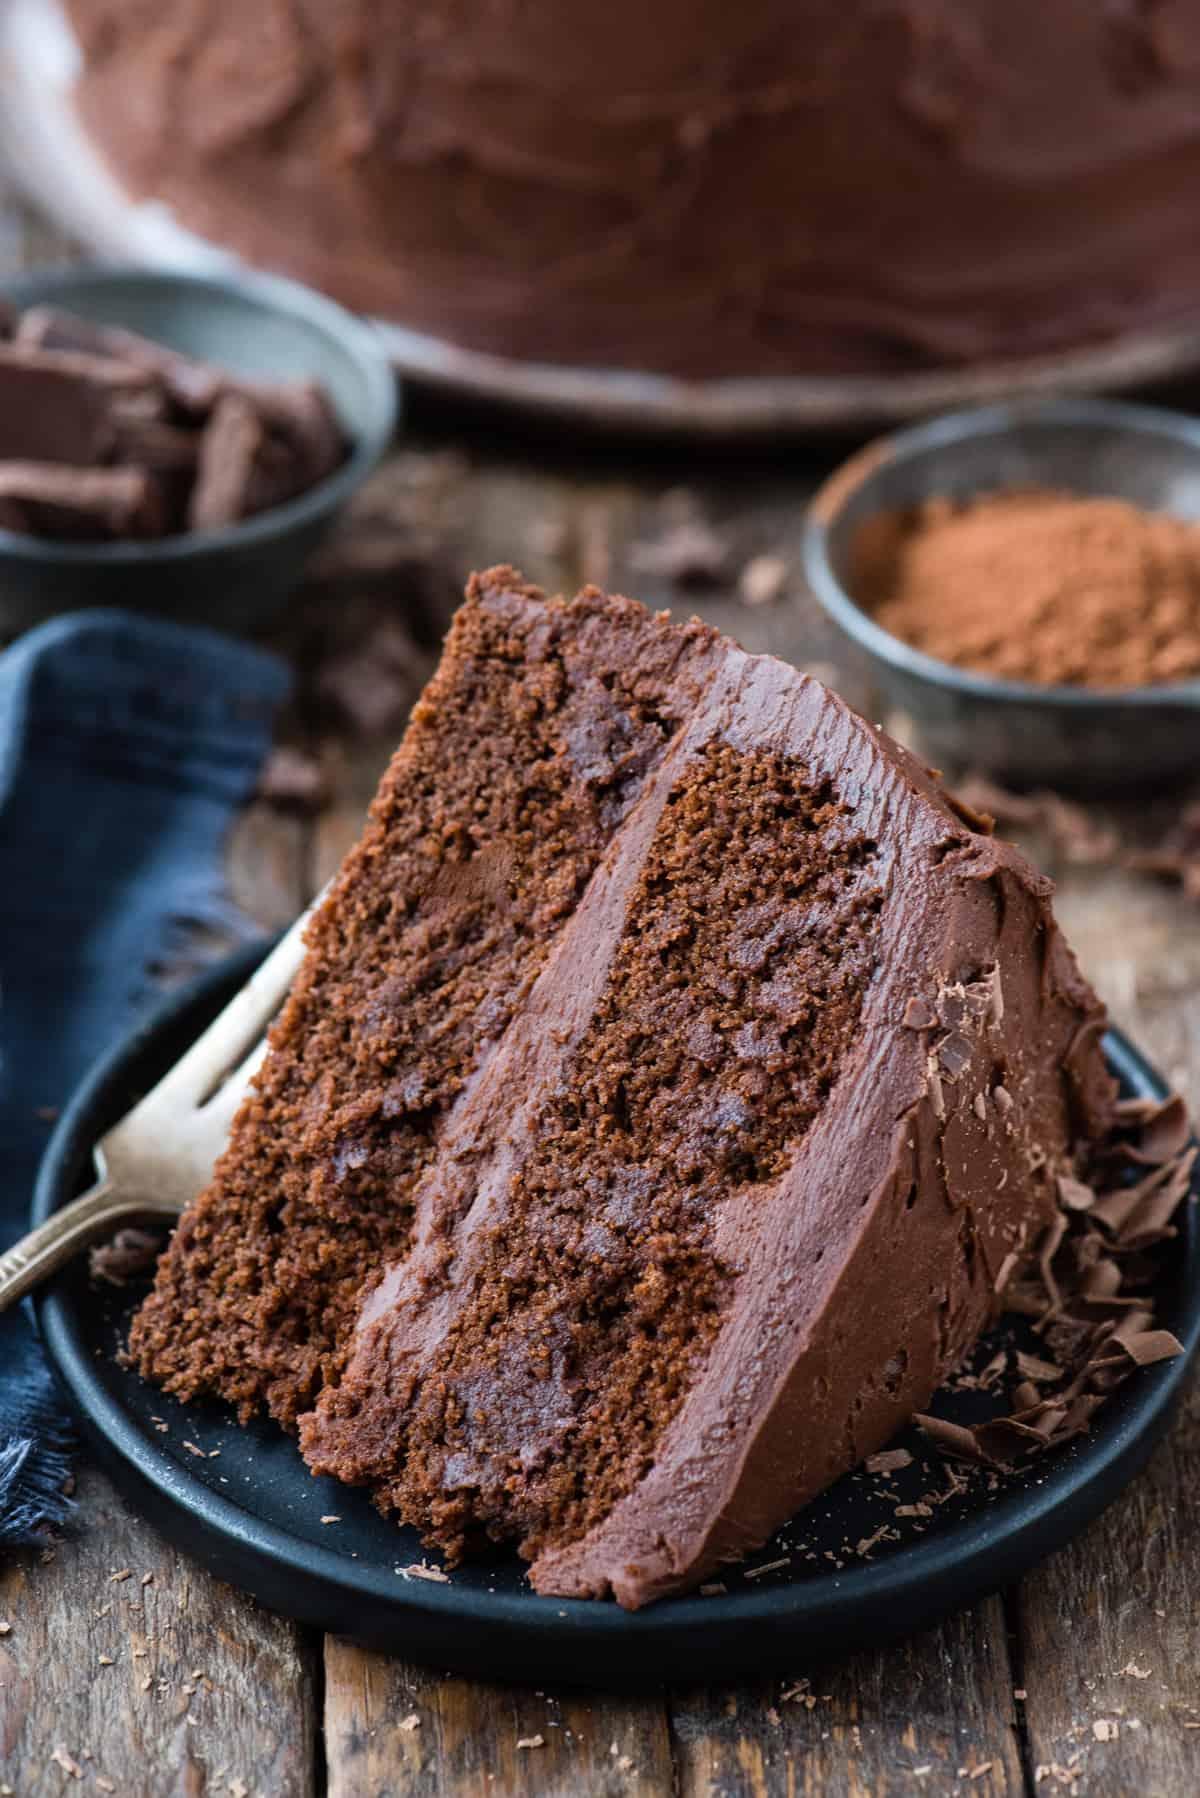 slice of chocolate cake on its side on dark blue plate on wood background